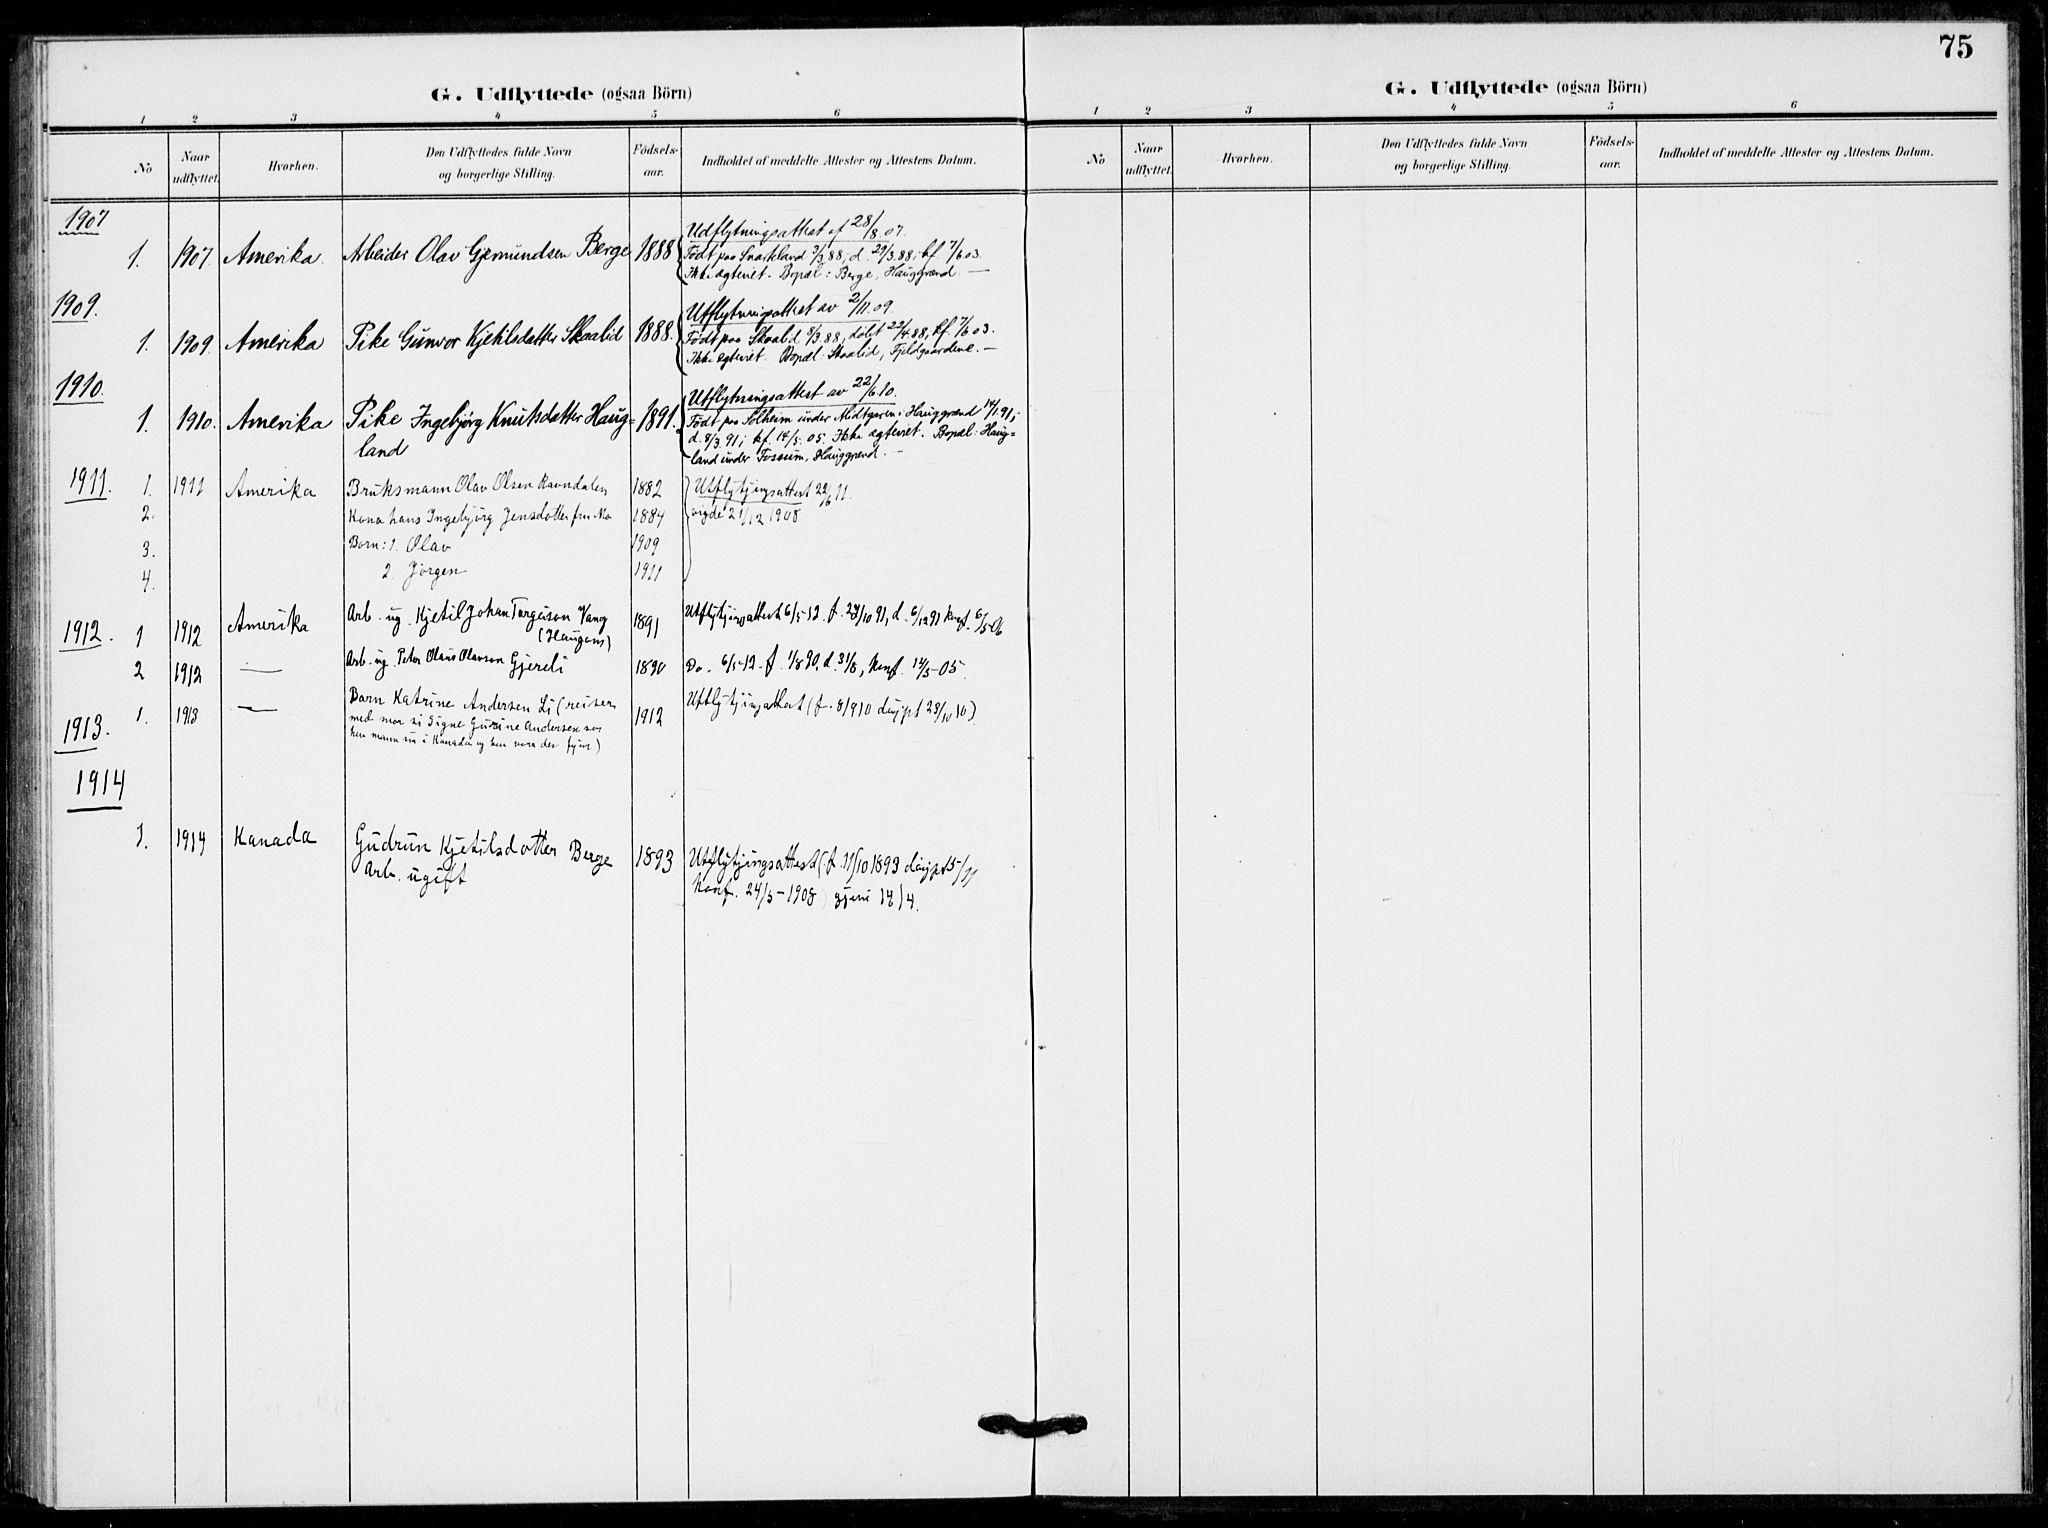 SAKO, Fyresdal kirkebøker, F/Fb/L0004: Ministerialbok nr. II 4, 1903-1920, s. 75